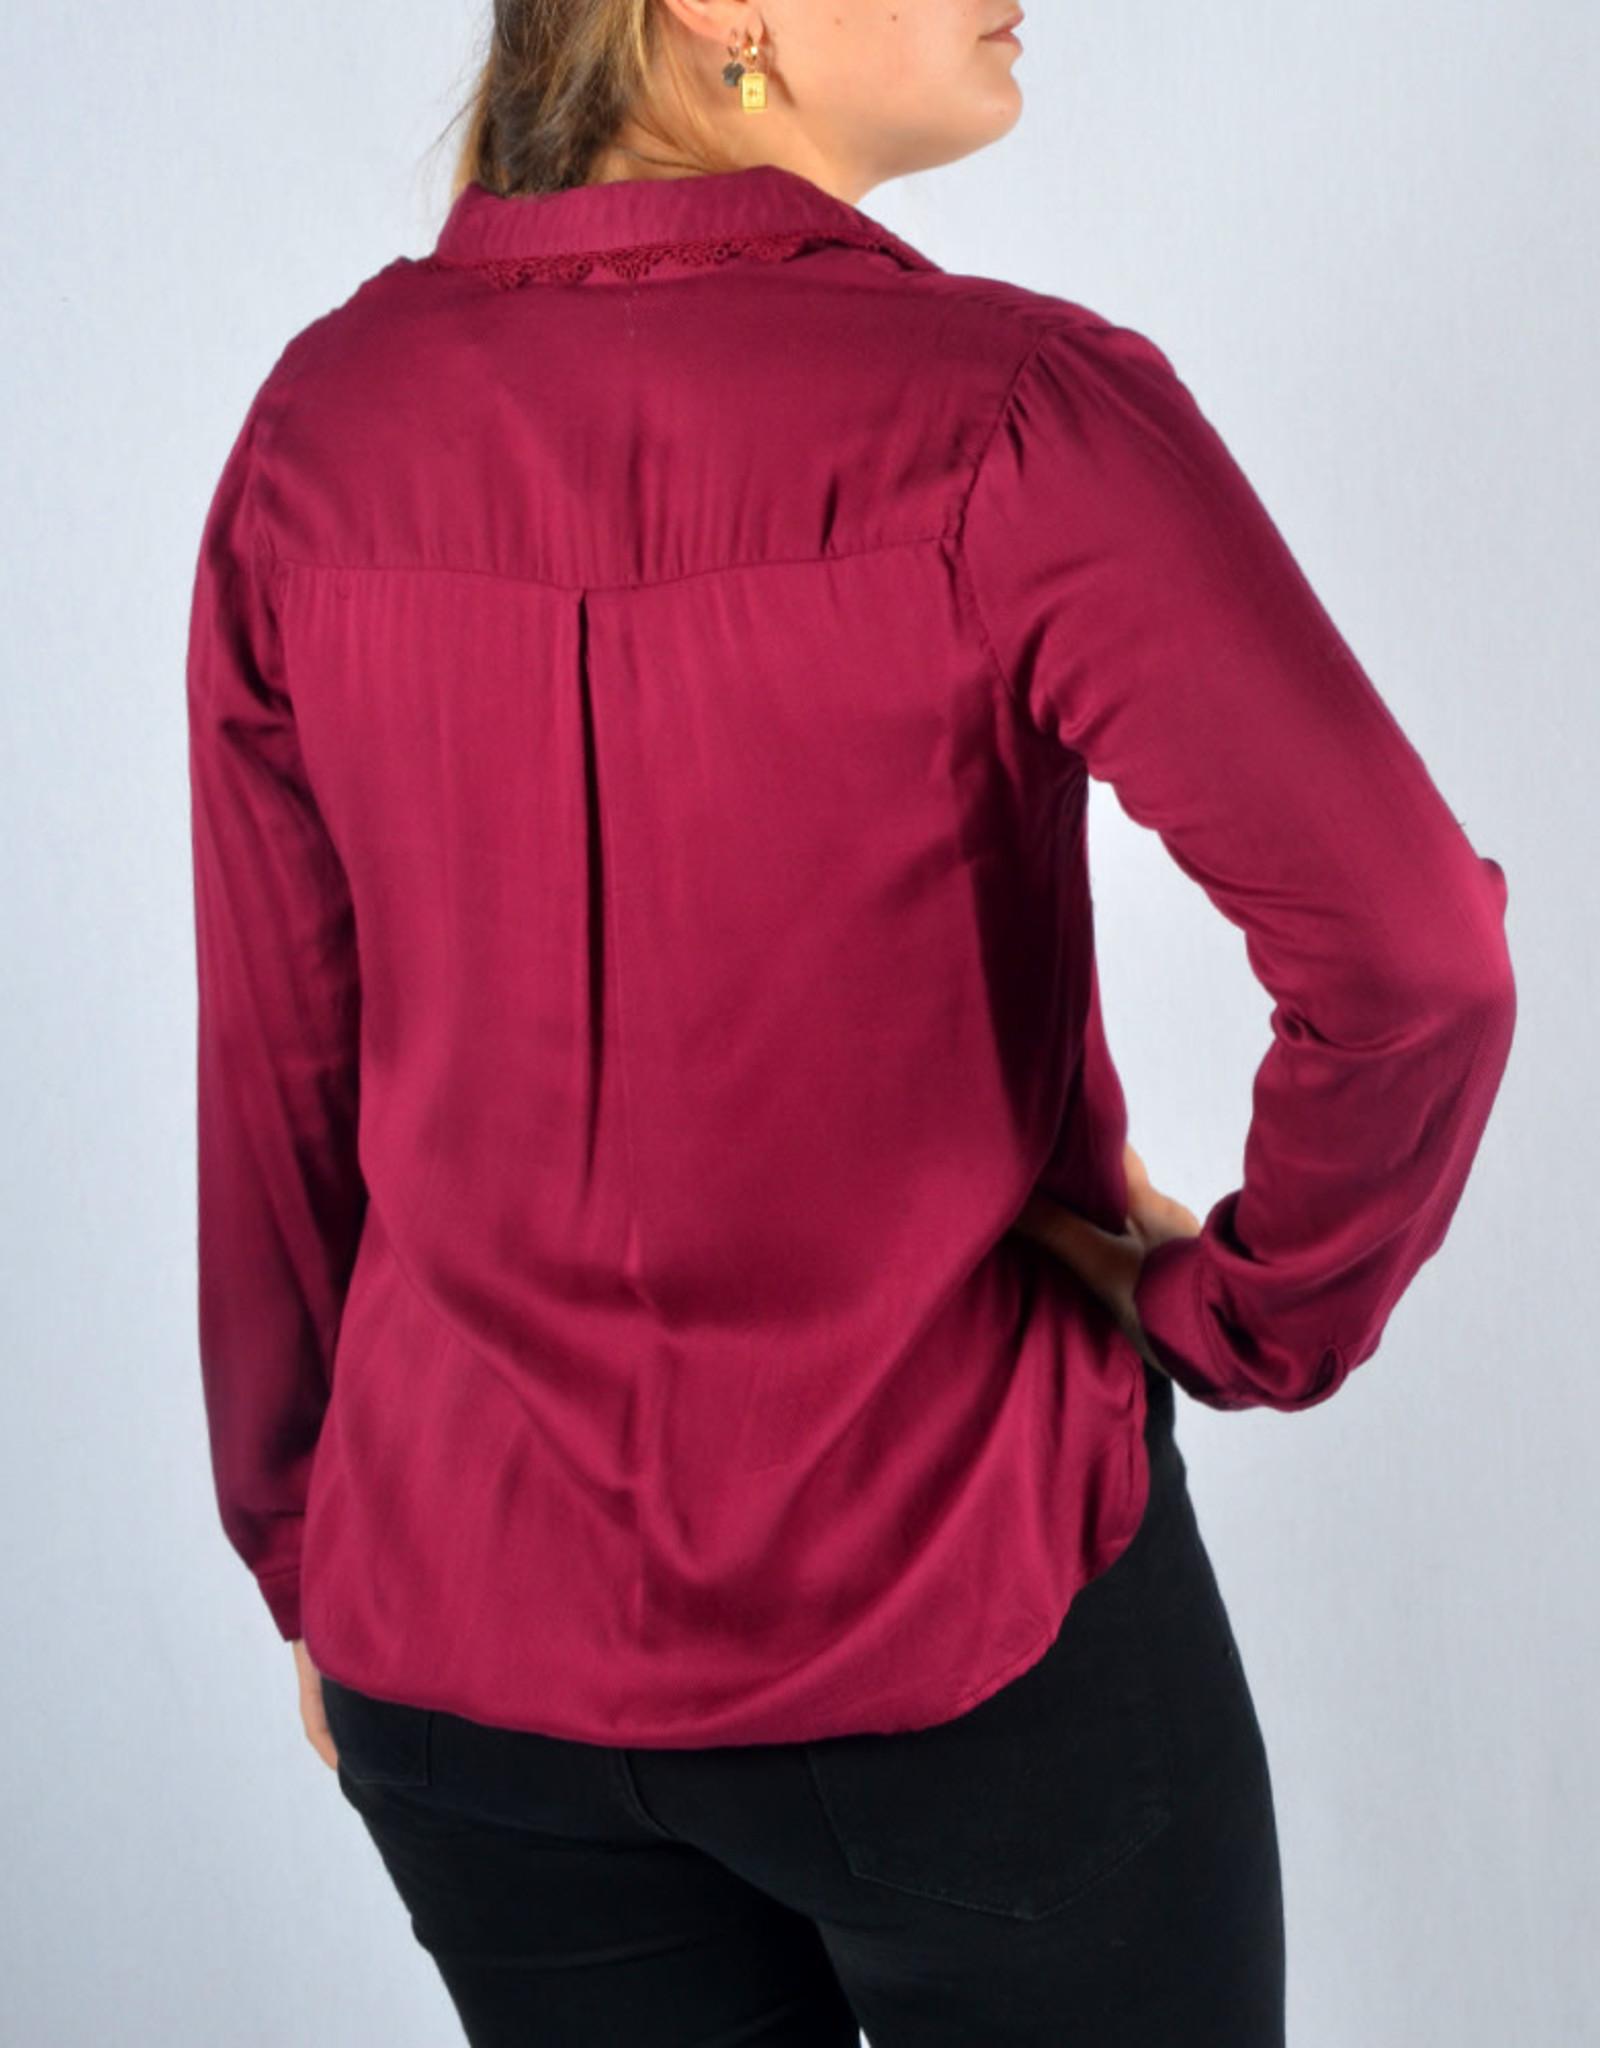 Burgundy lace blouse